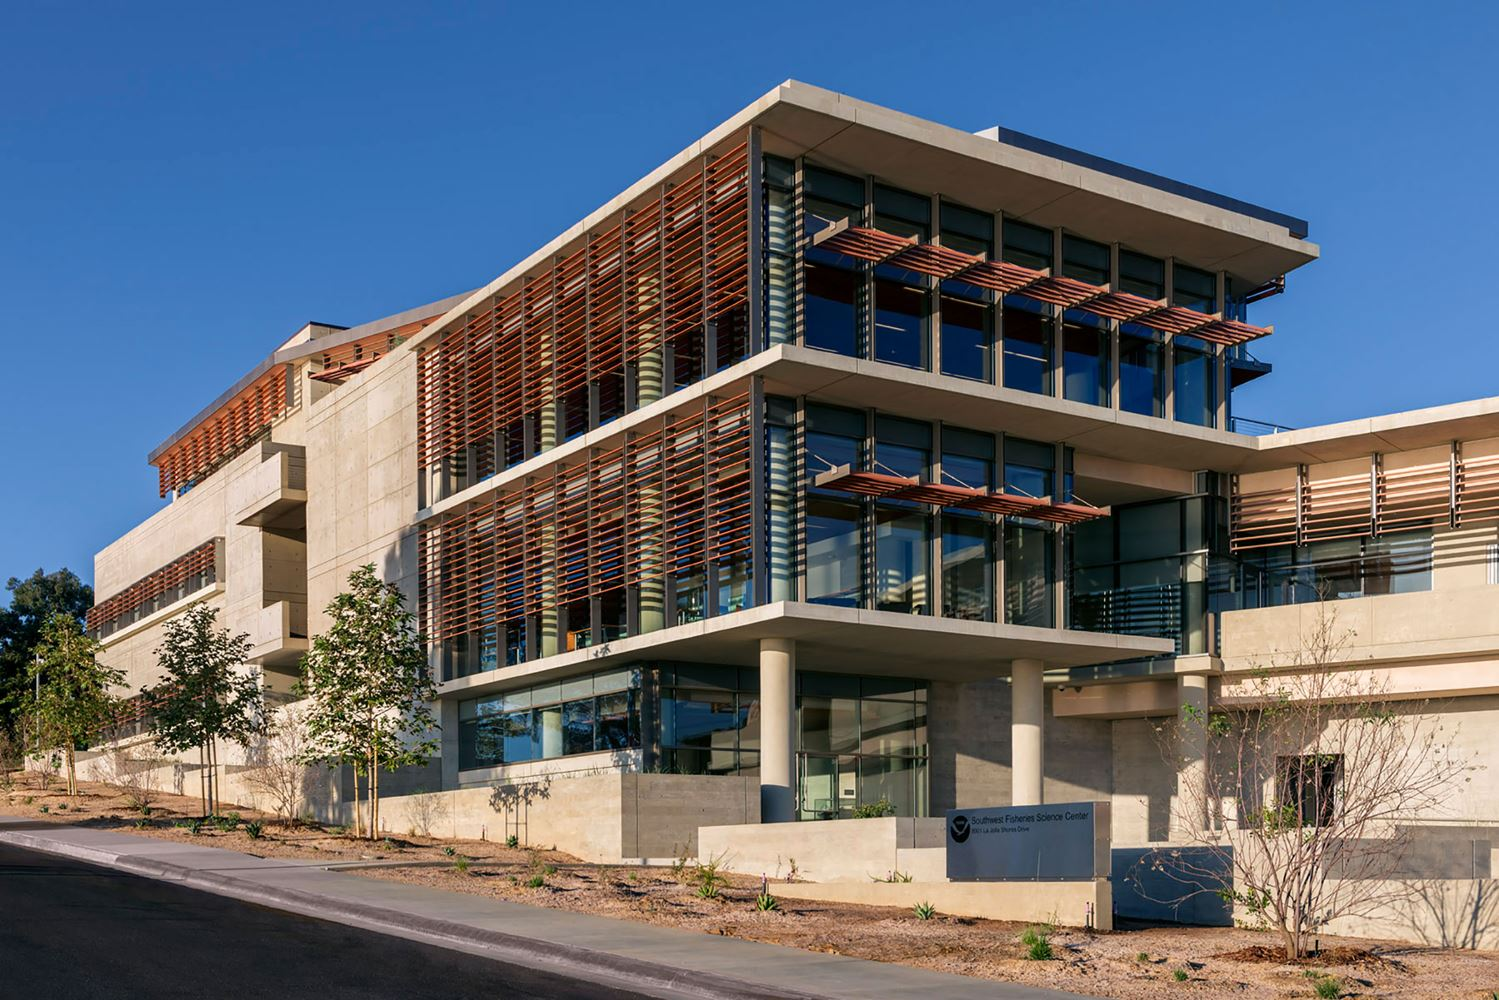 Gould evans kansas city architects for Architecture firms kc